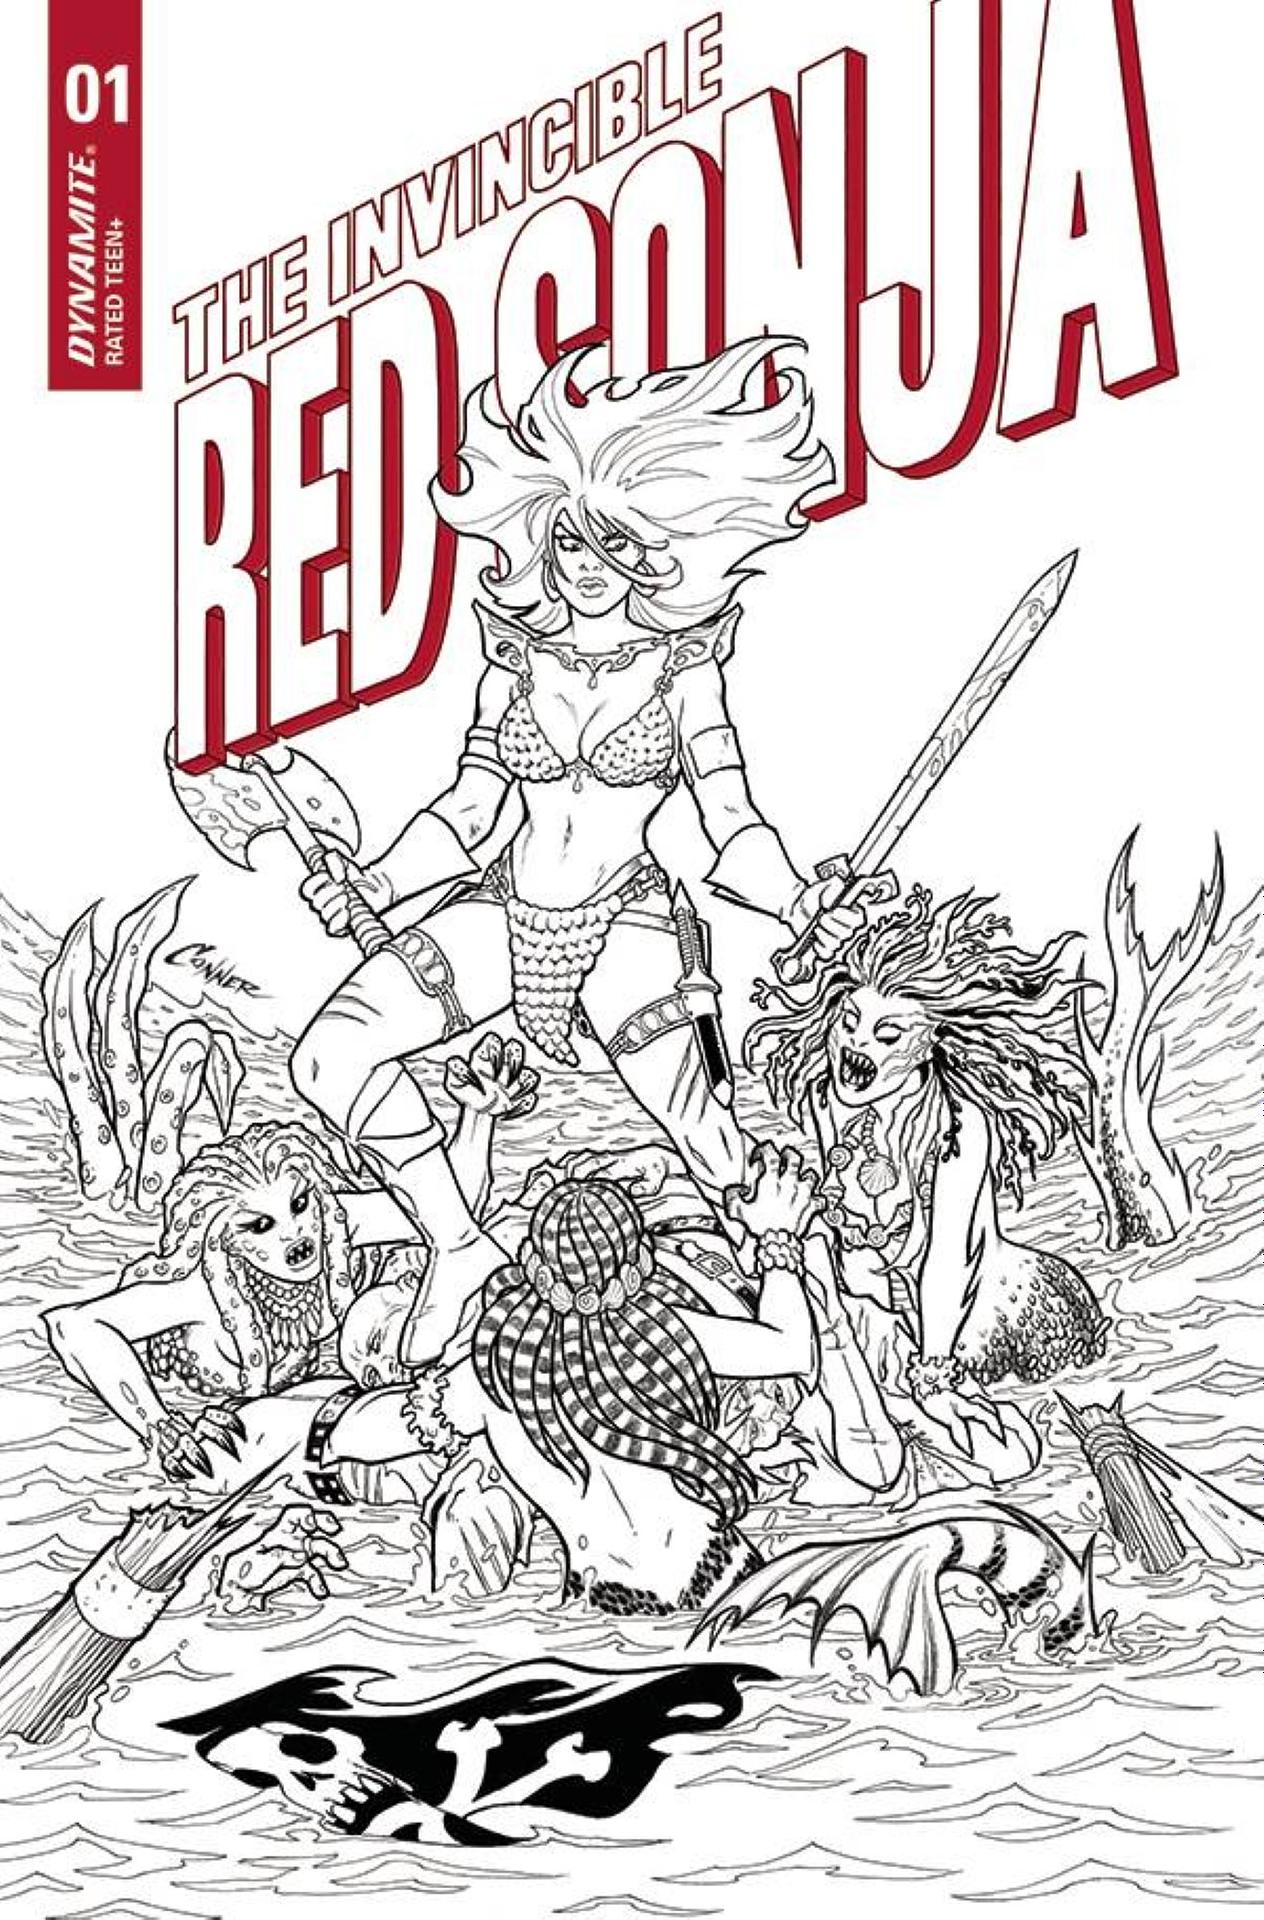 INVINCIBLE RED SONJA #1 15 COPY CONNER LINE ART INCV